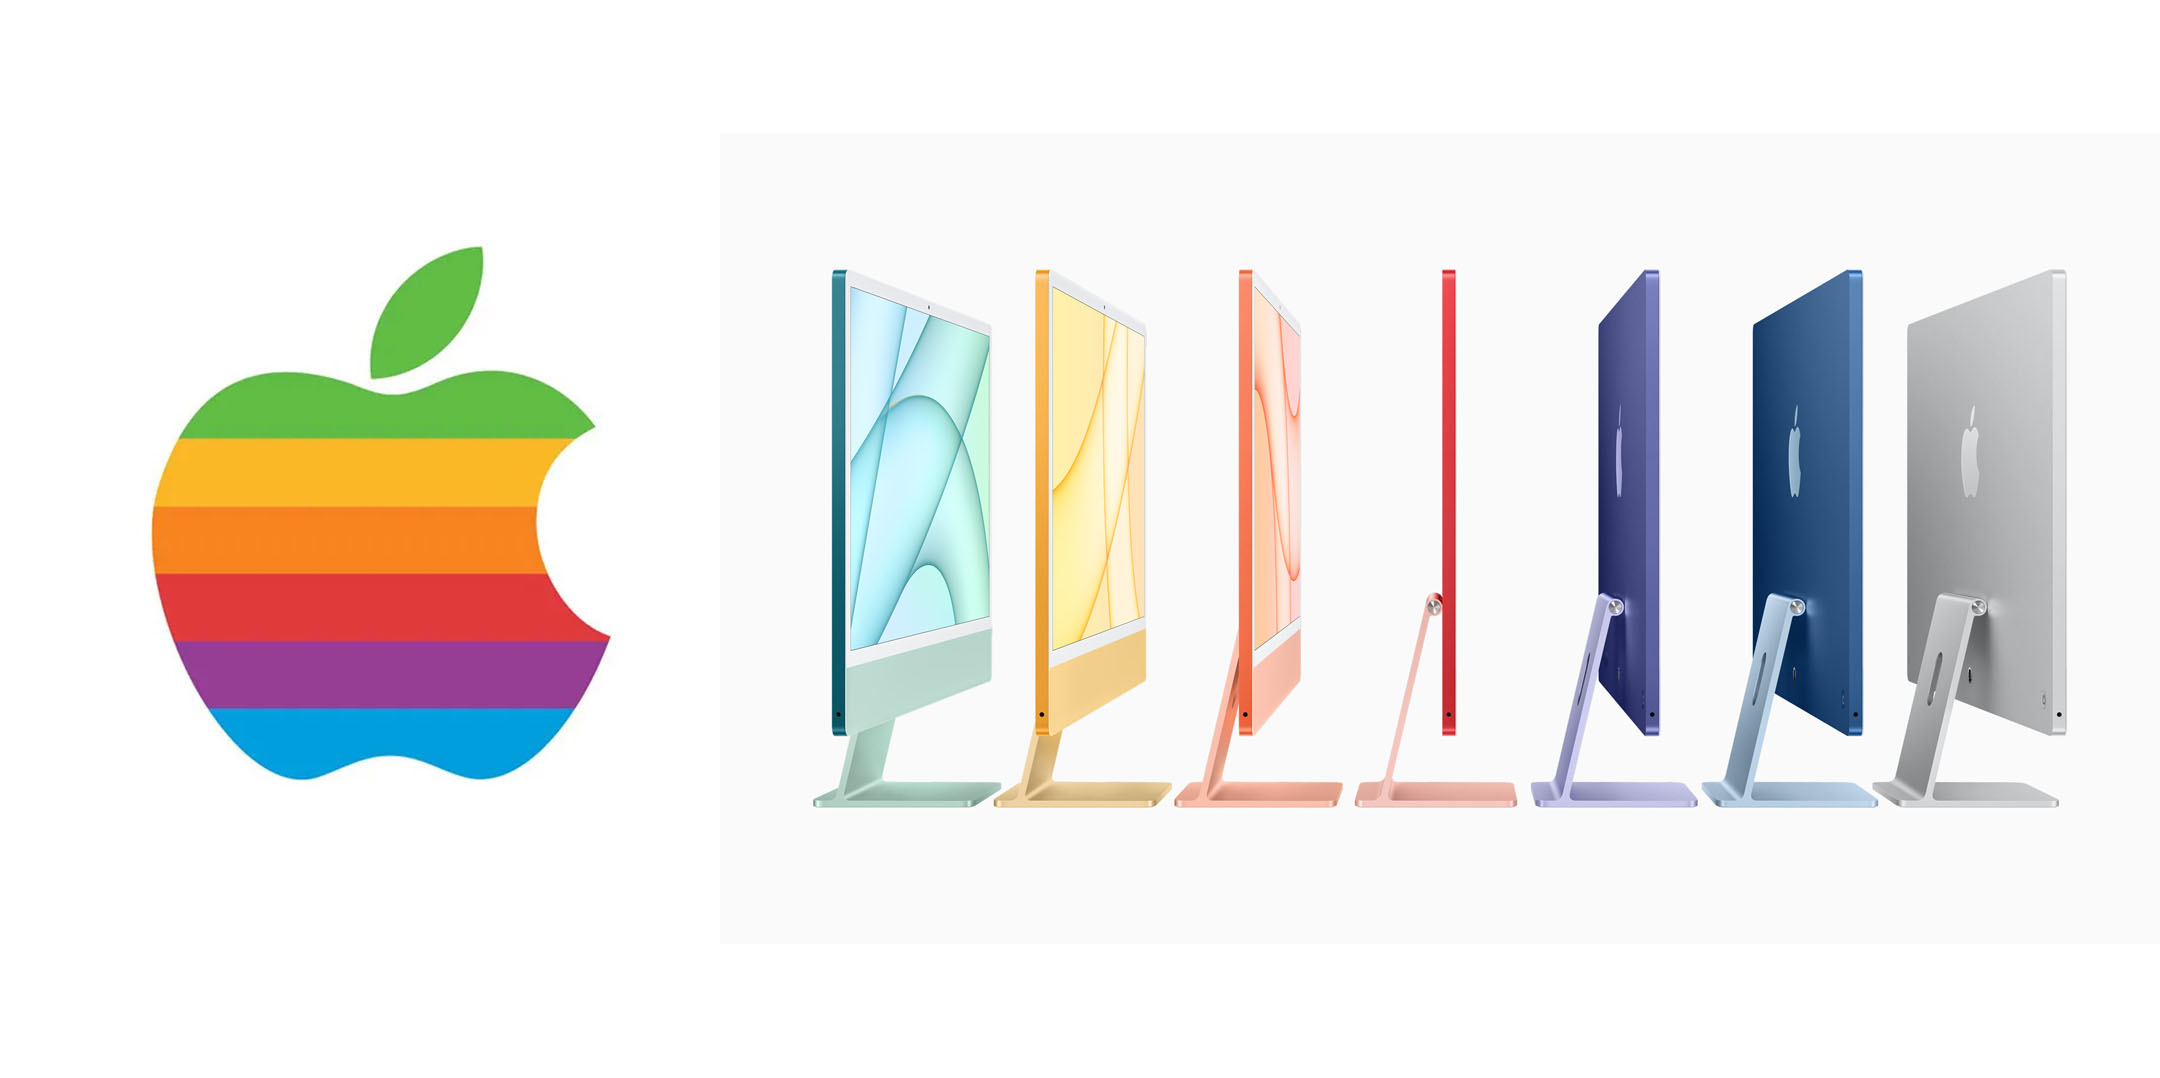 iMac 2021 Rainbow